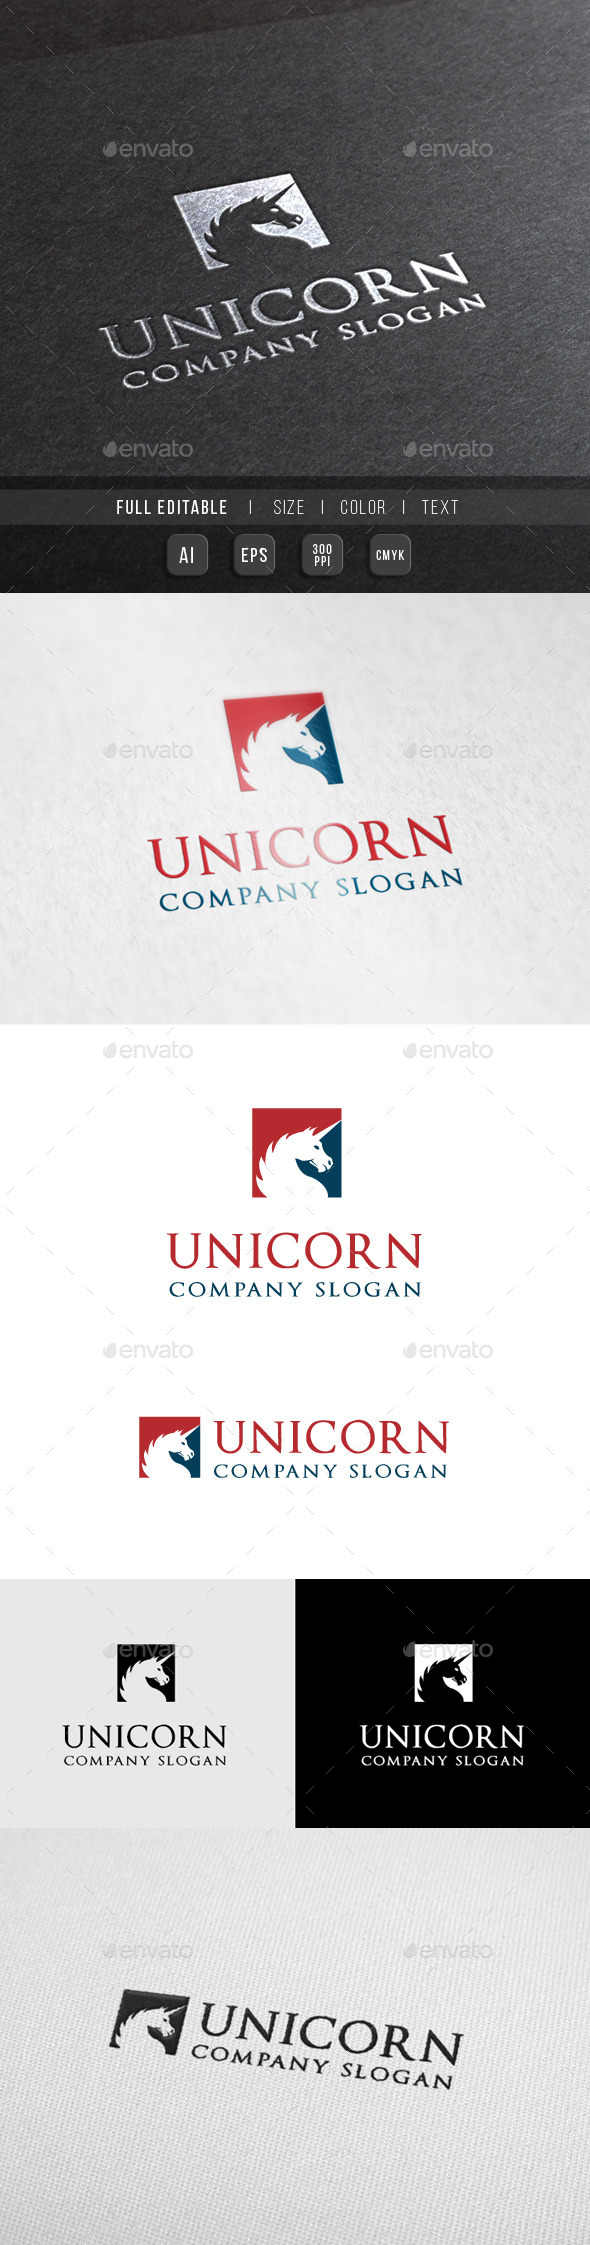 Unicorn Finance - Consulting Logo